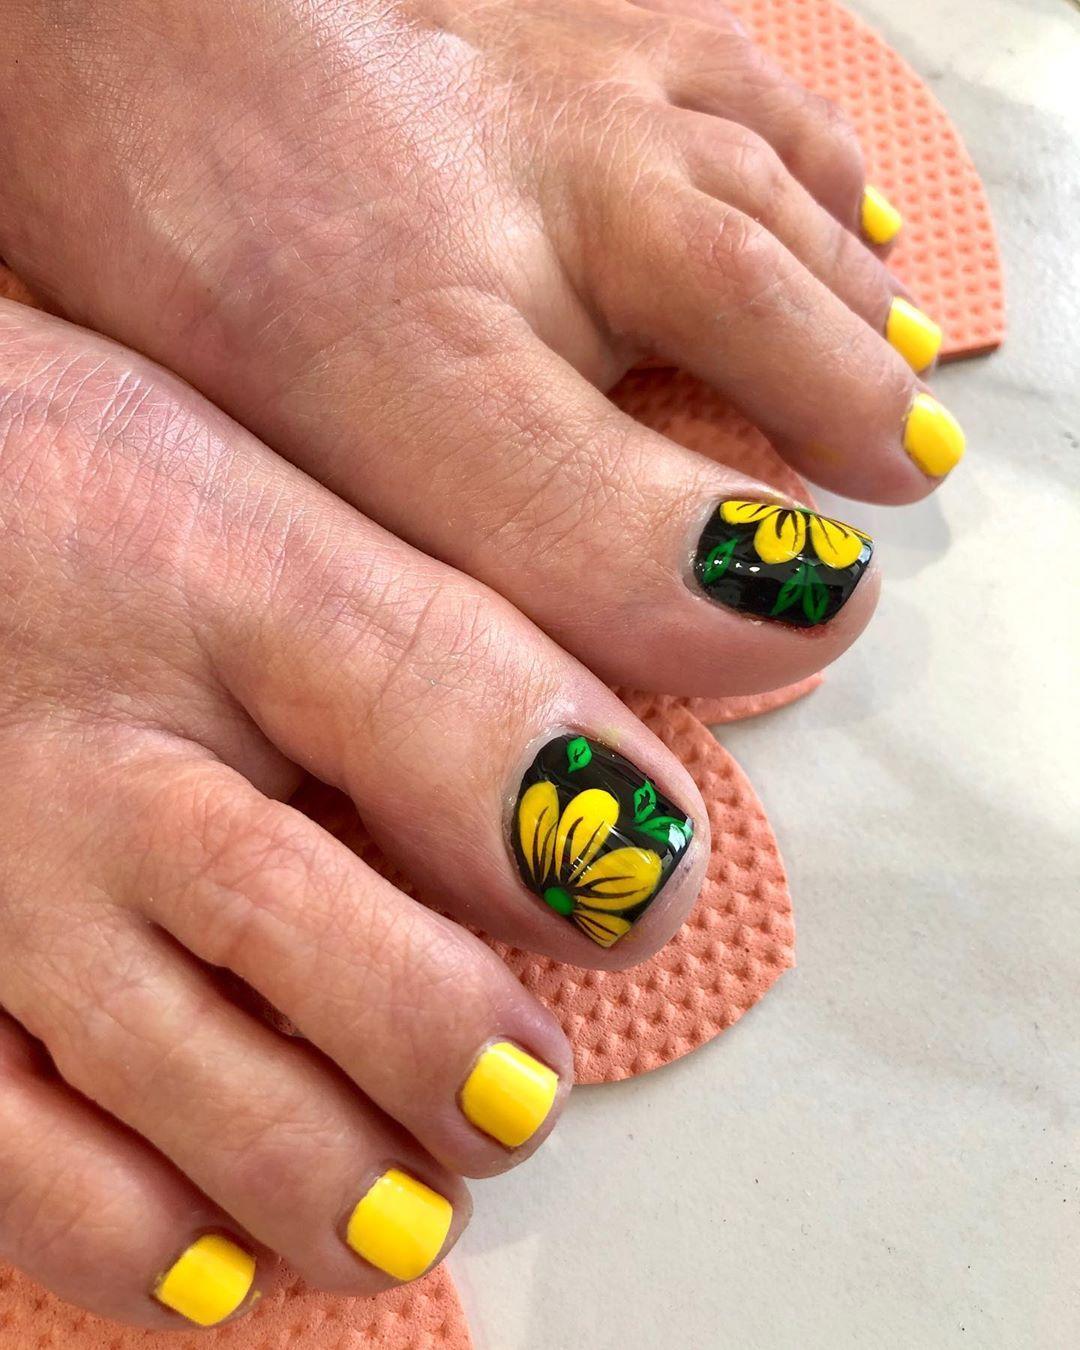 Leboutin Nails On Instagram Summer Flowers Flowers Summer Summerflowers Yellownails Yellow Toe Nail Flower Designs Flower Toe Nails Yellow Toe Nails